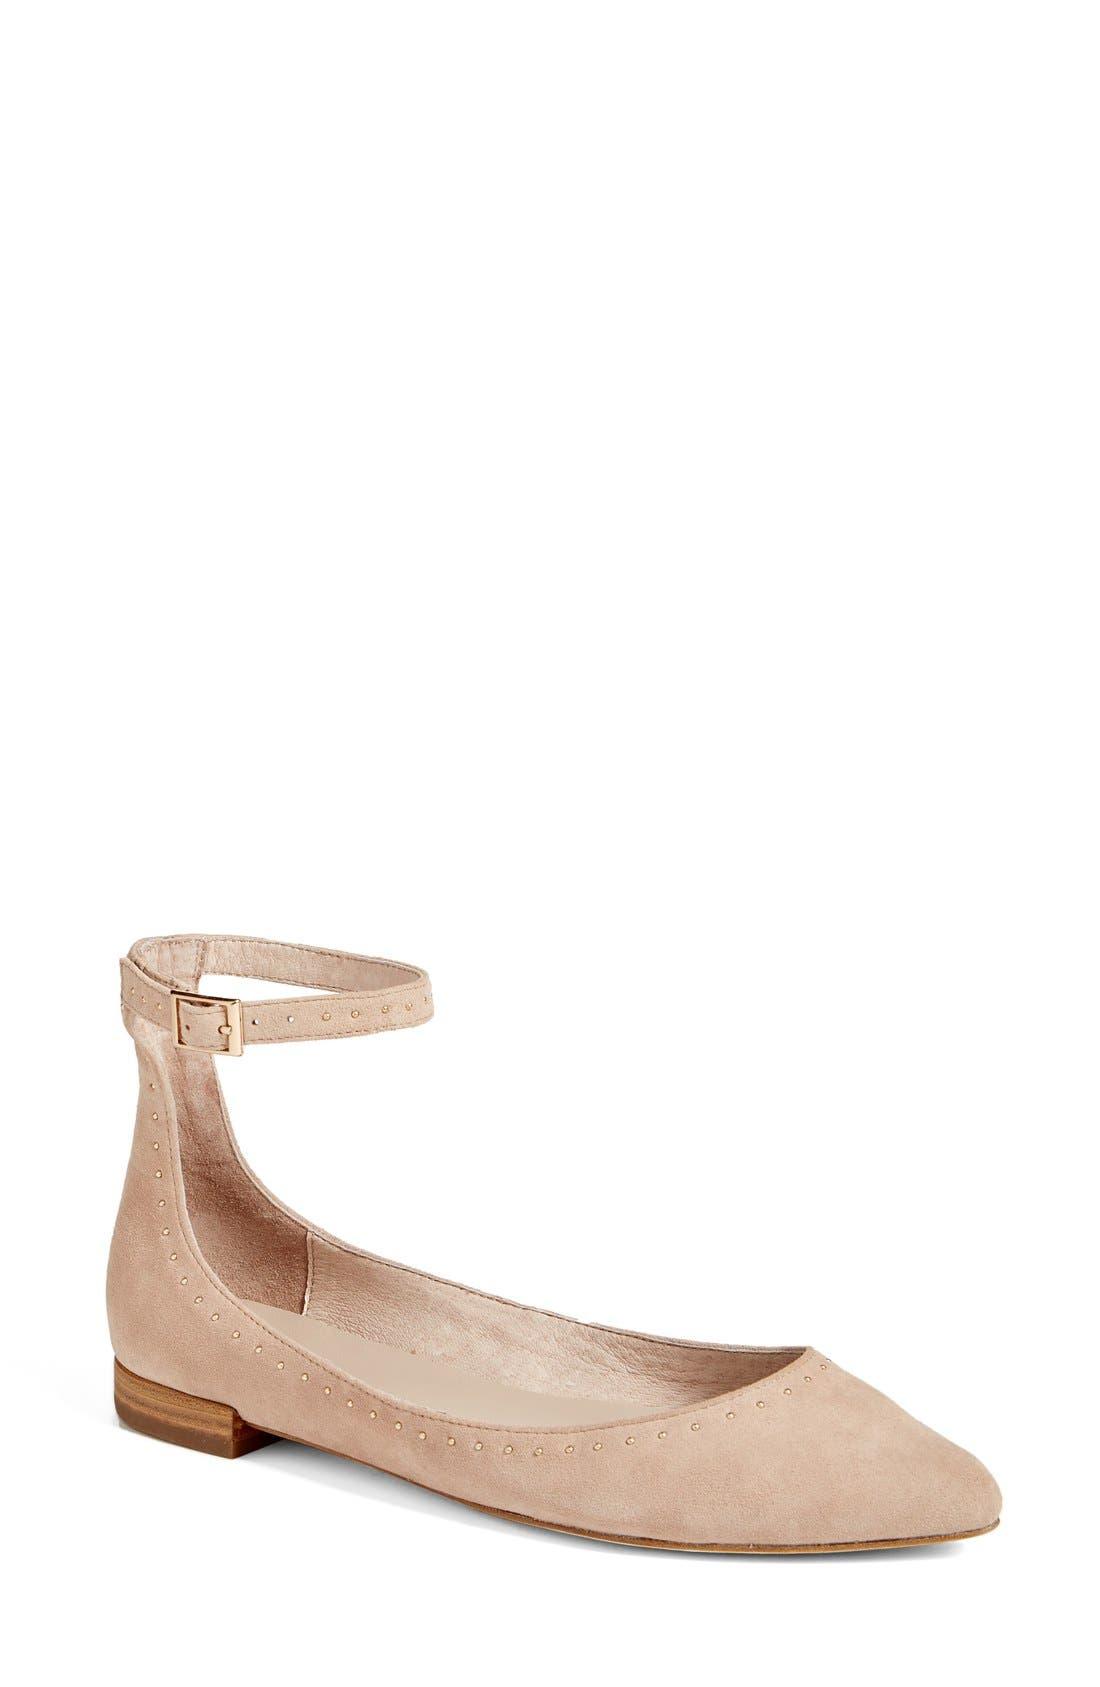 Afra Ankle Strap Ballet Flat,                             Main thumbnail 1, color,                             250